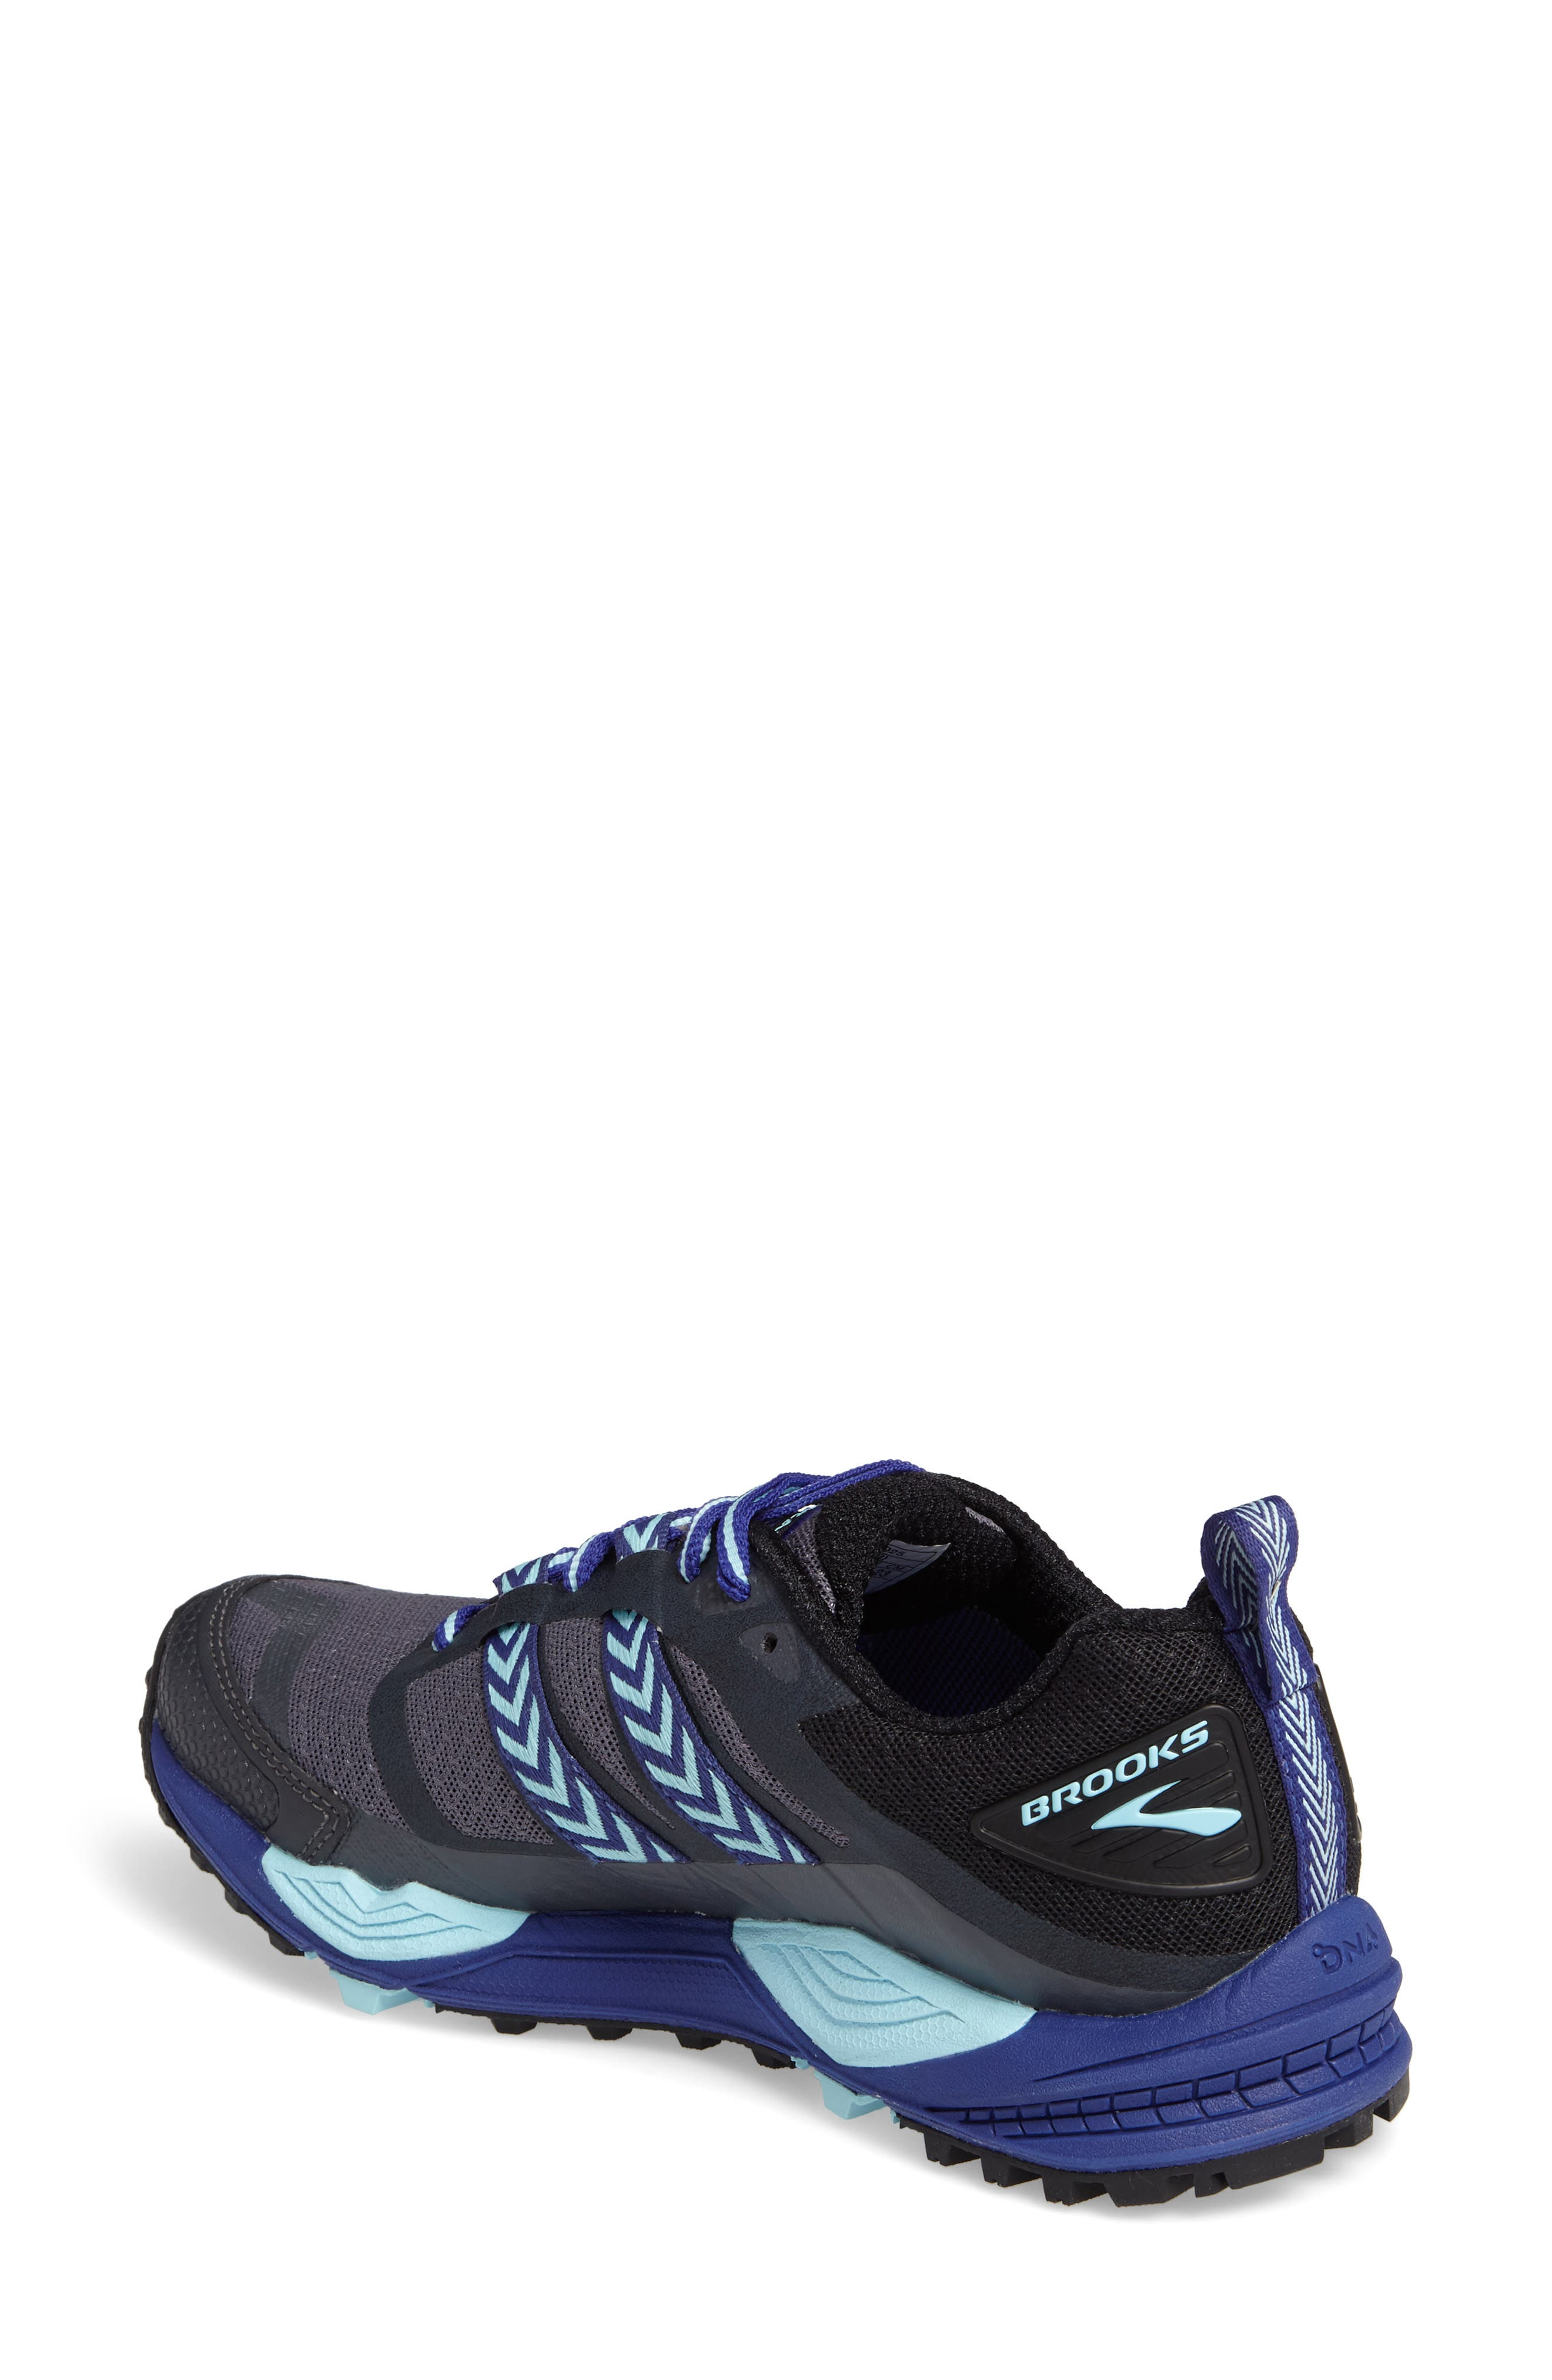 Alternate Image 2  - Brooks Cascadia 12 GTX Trail Running Shoe (Women)